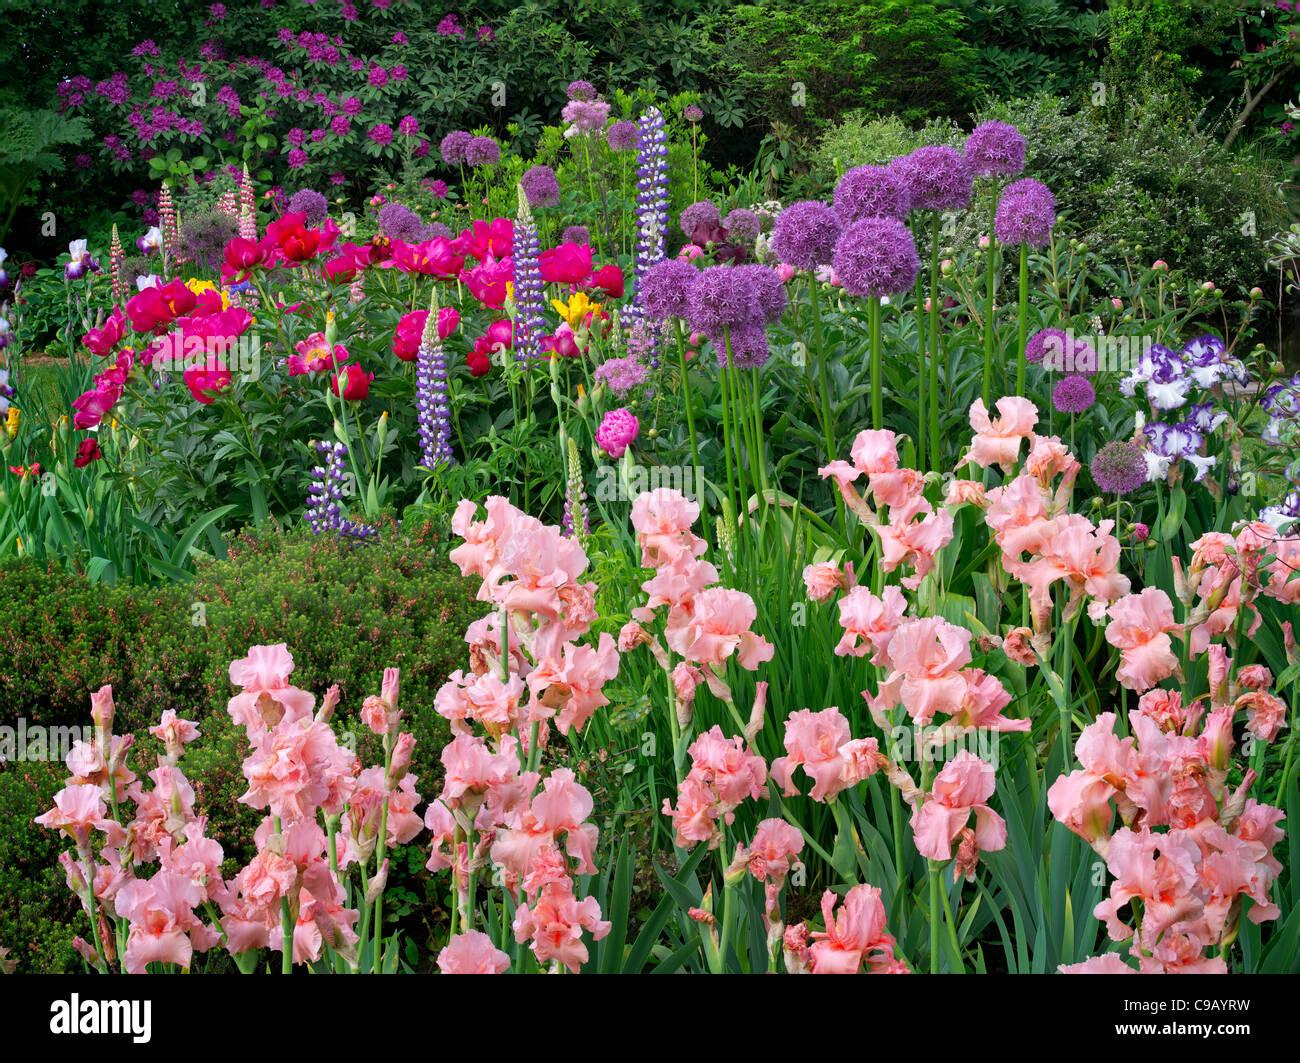 Iris and other flowers at Schreiner's iris Gardens. Brooks, Oregon - Stock Image